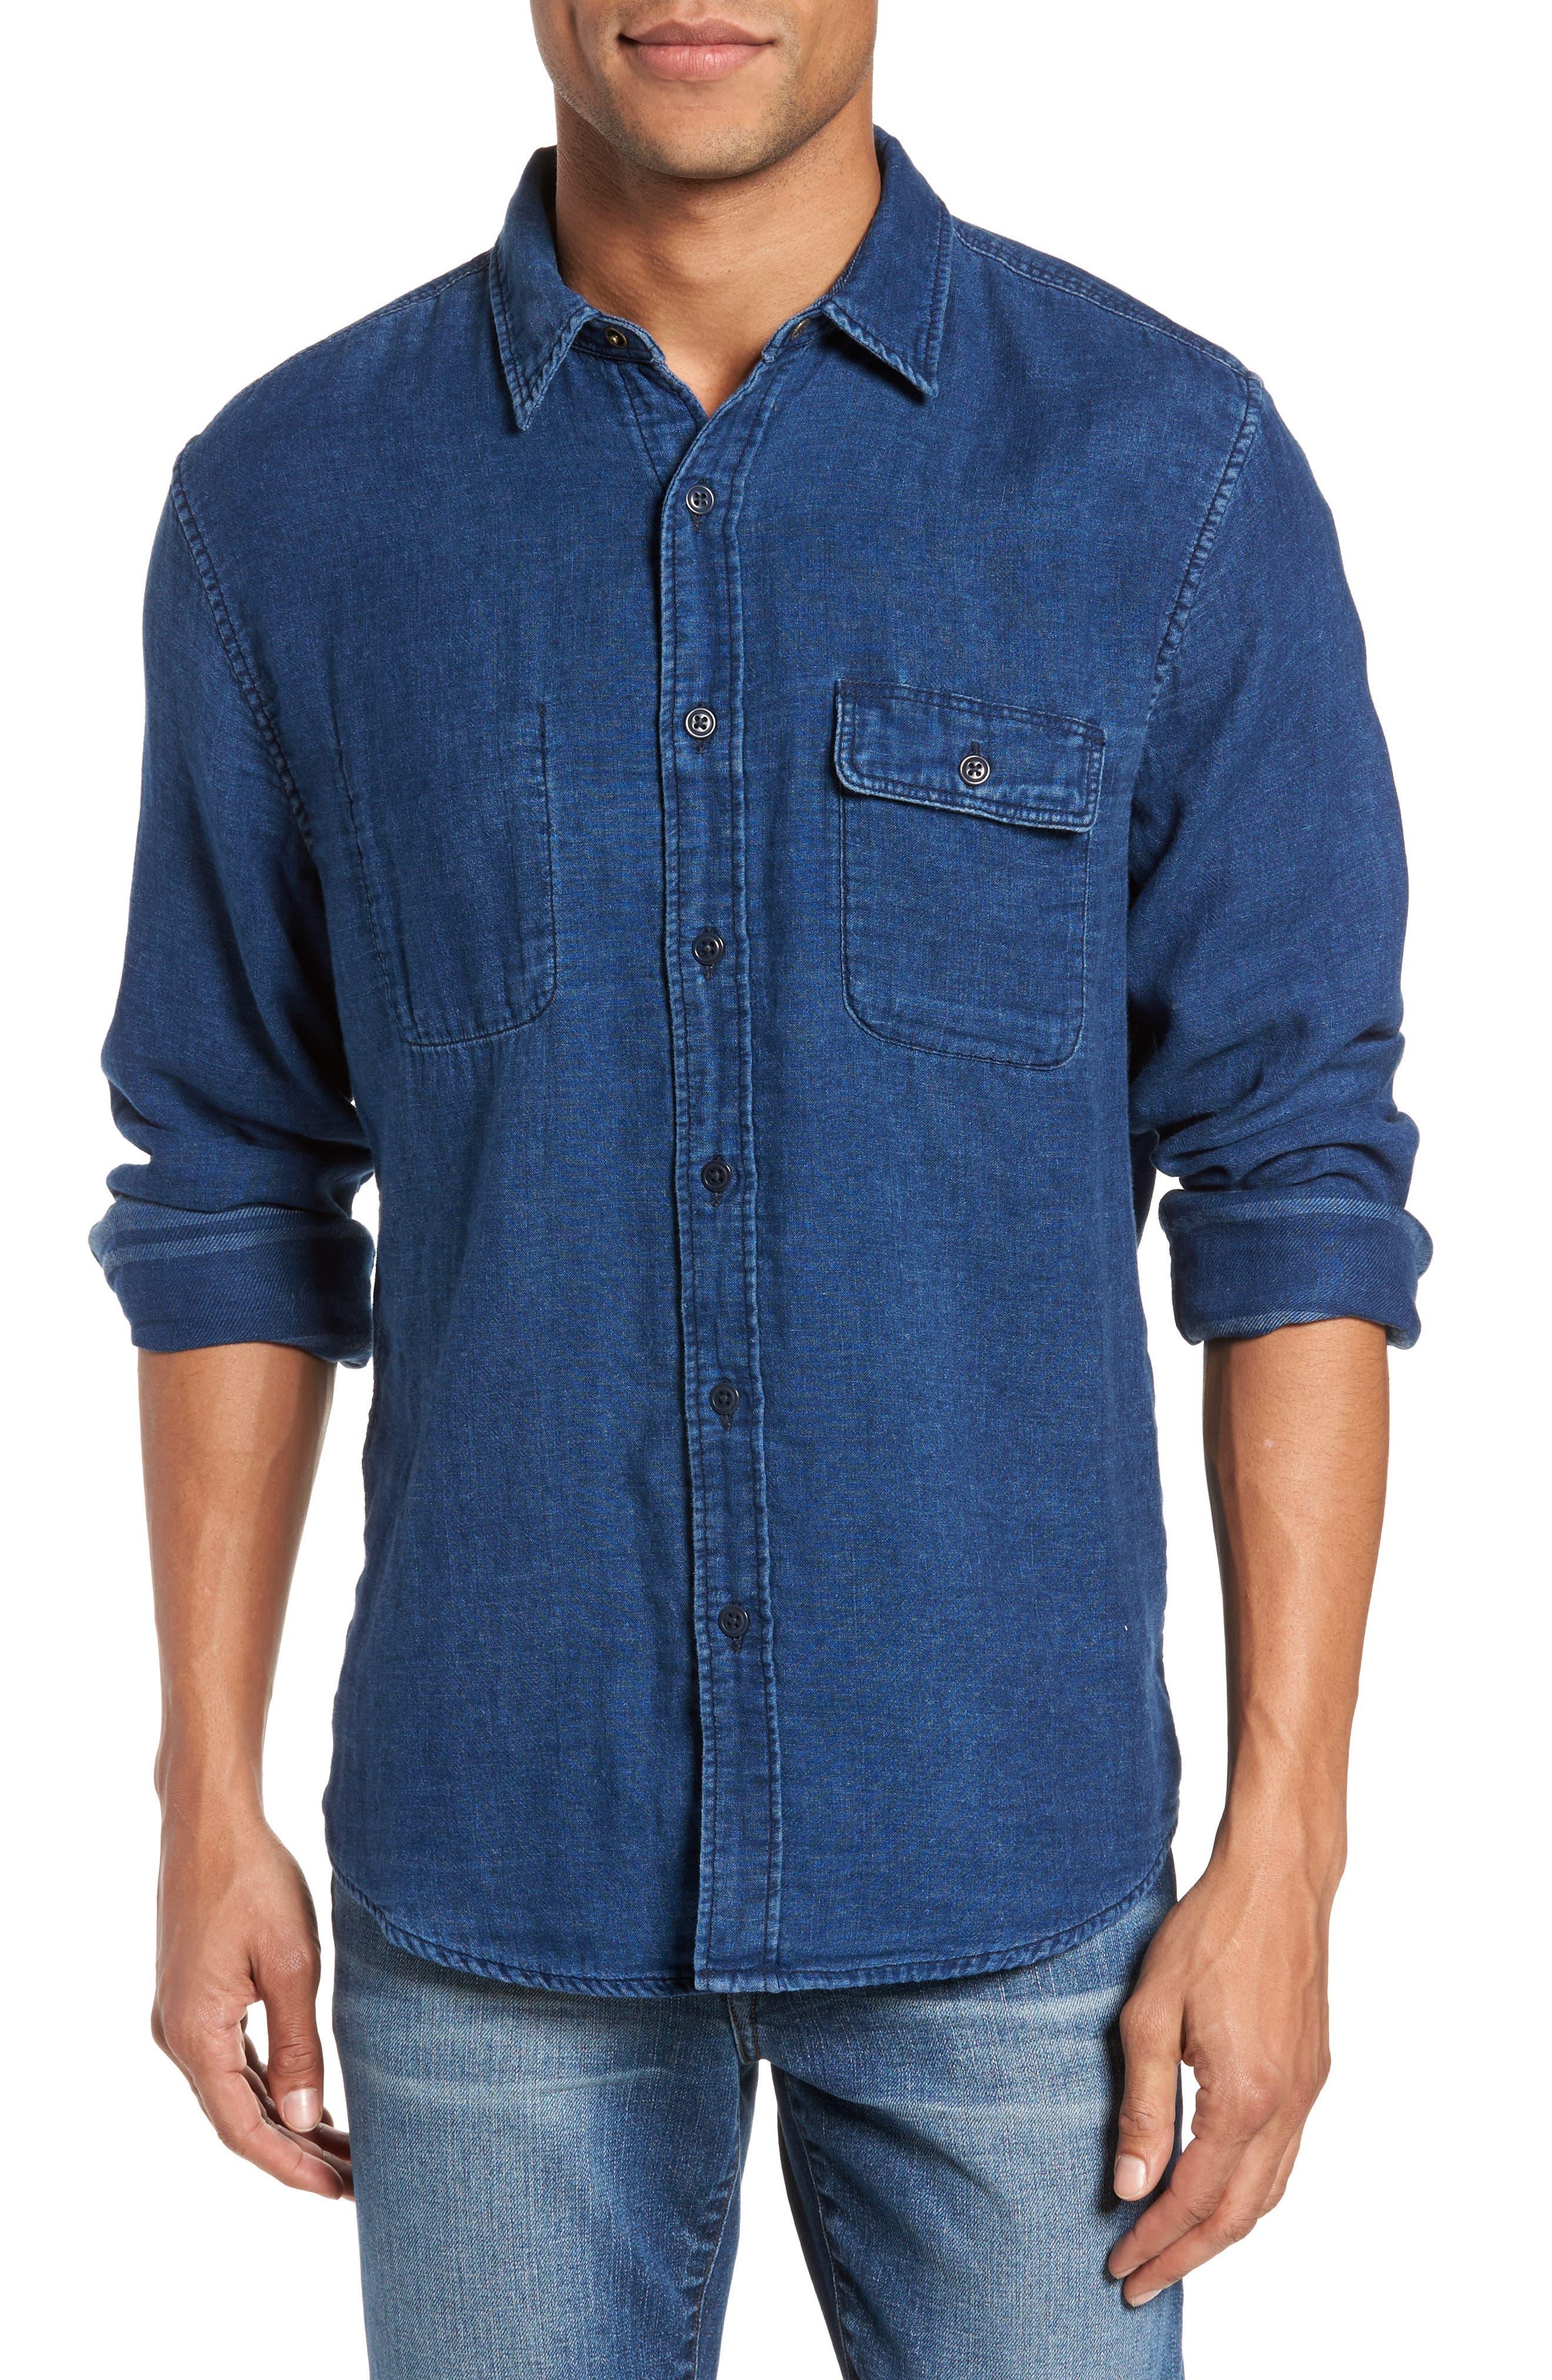 Alternate Image 1 Selected - Faherty Brand Belmar Reversible Work Shirt